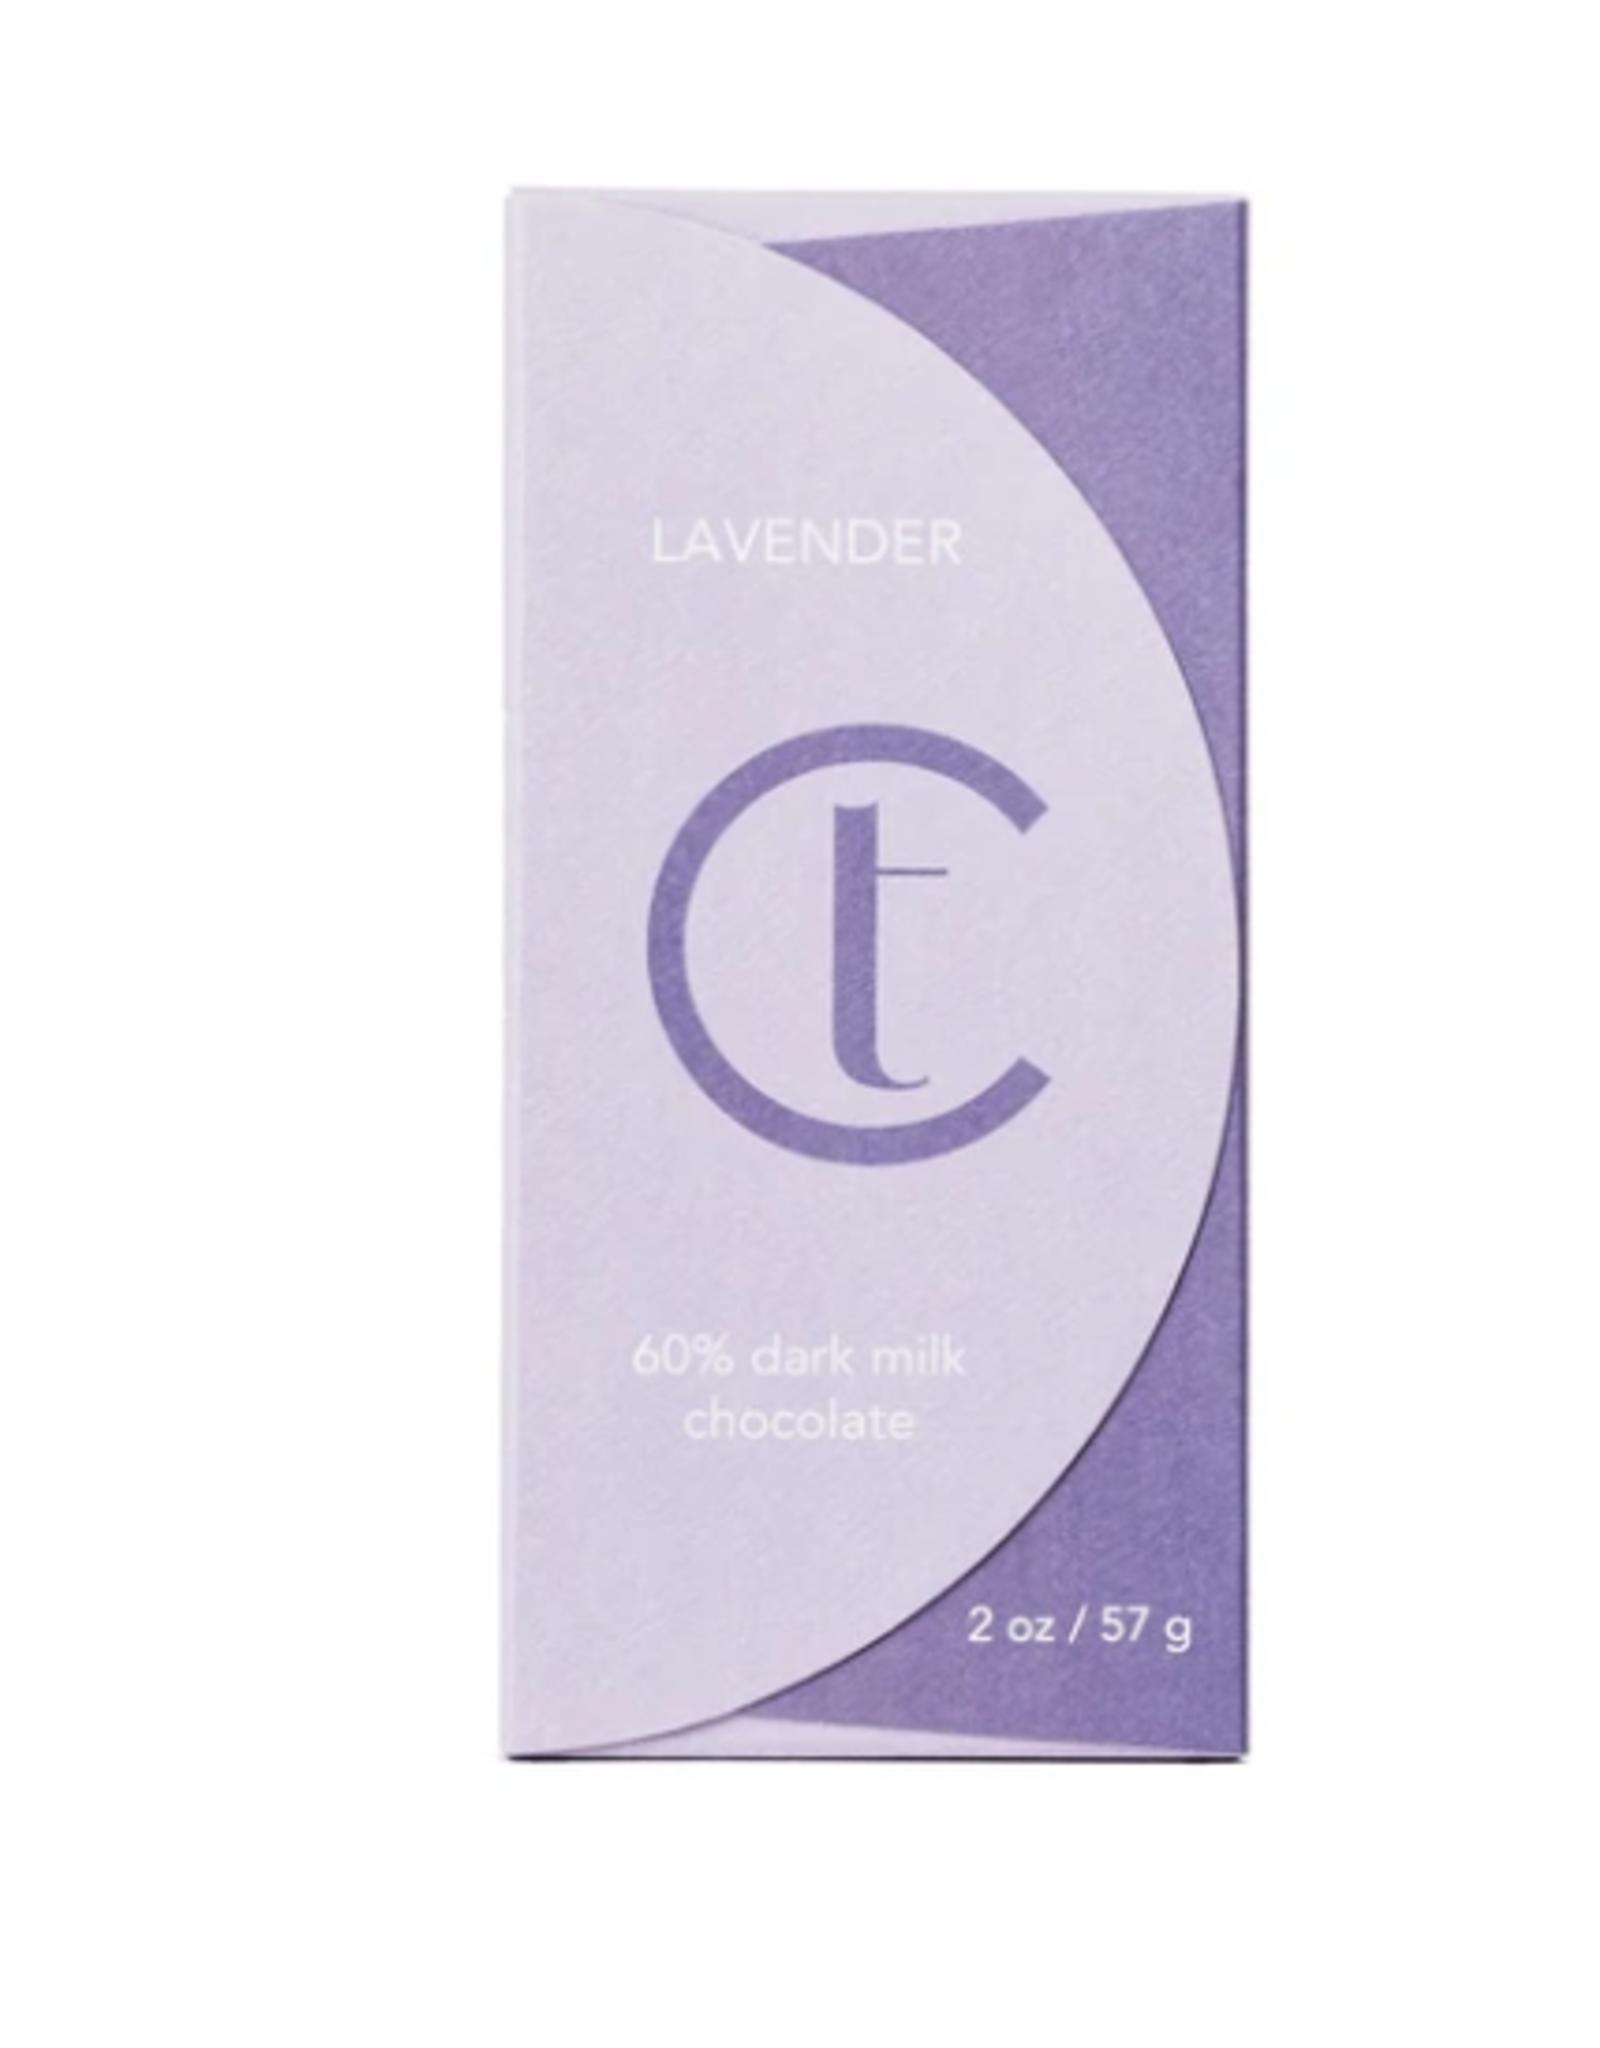 Terroir Chocolate Dark Milk Chocolate 60% Lavender